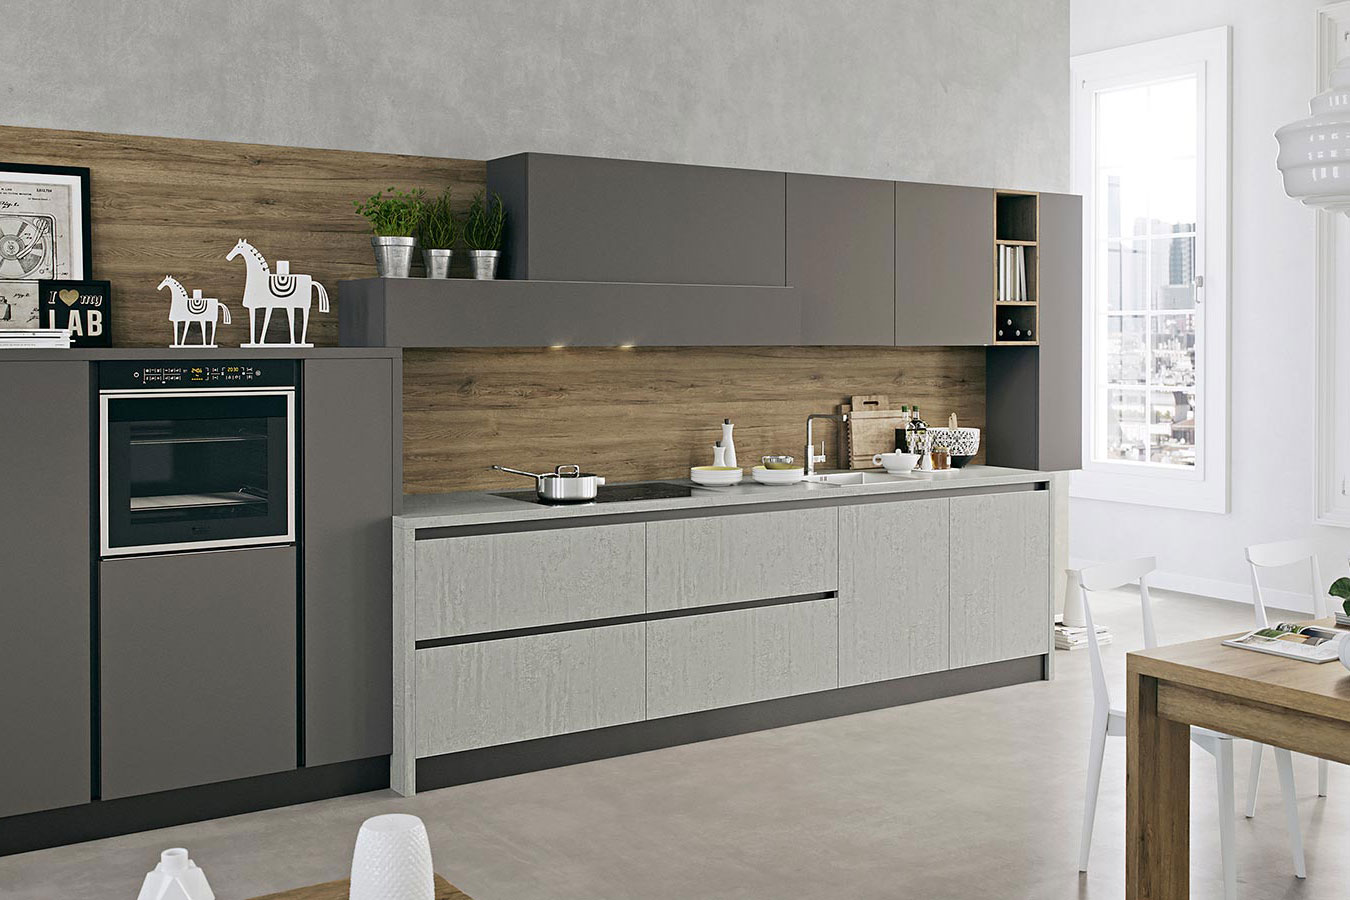 Cucina kal di arredo3 righetti mobili novara - Cucina arredo3 kali ...